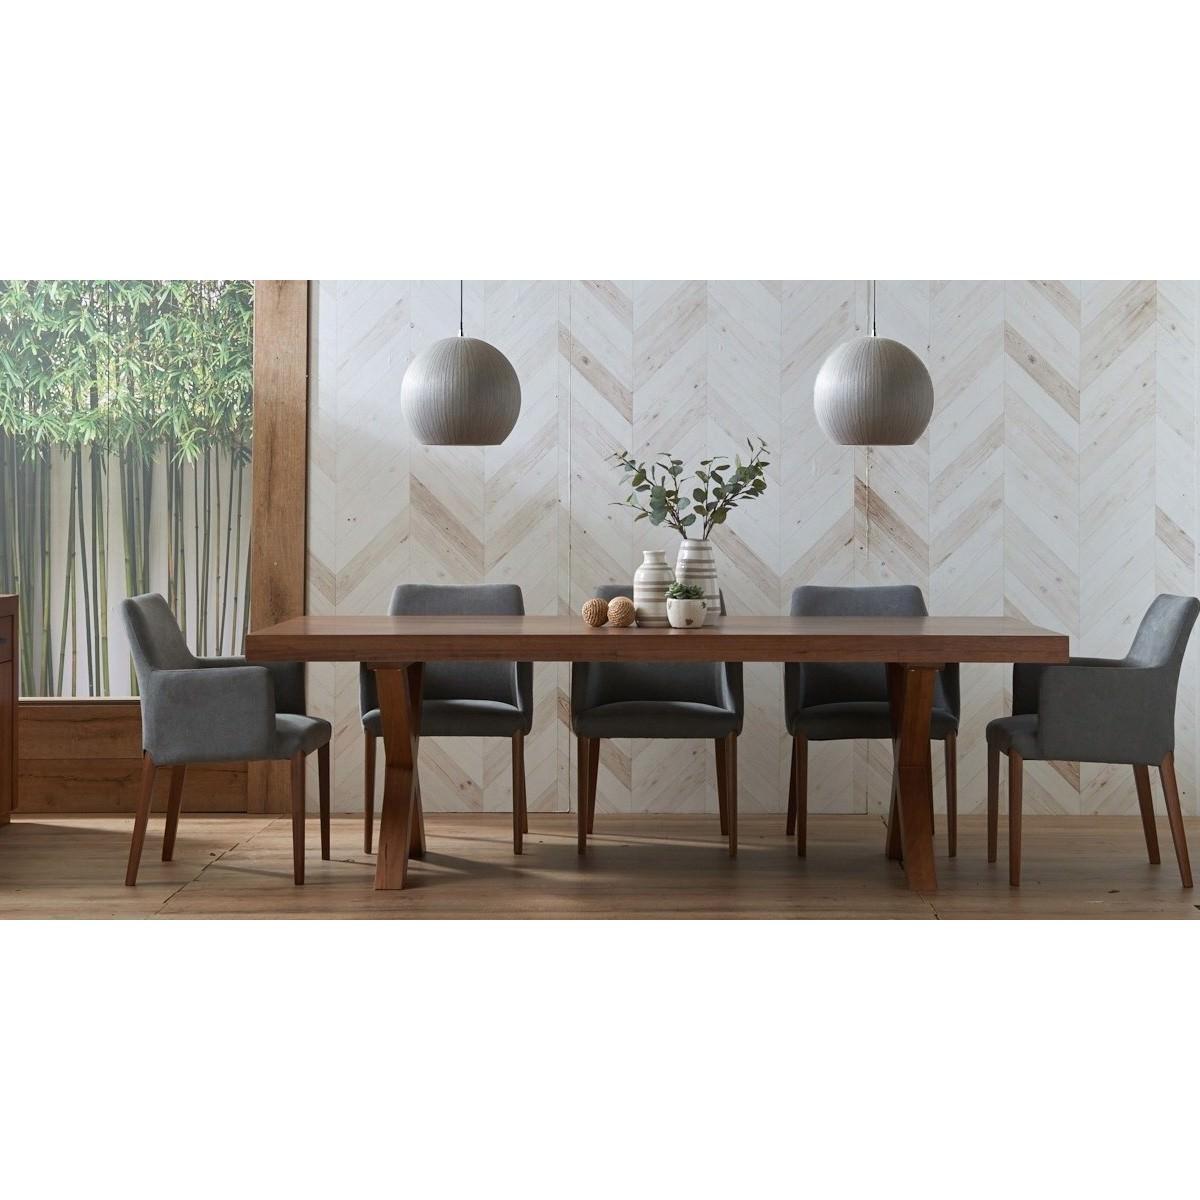 Madalyn 9 Piece Tasmania Oak Timber Dining Table Set, 240cm